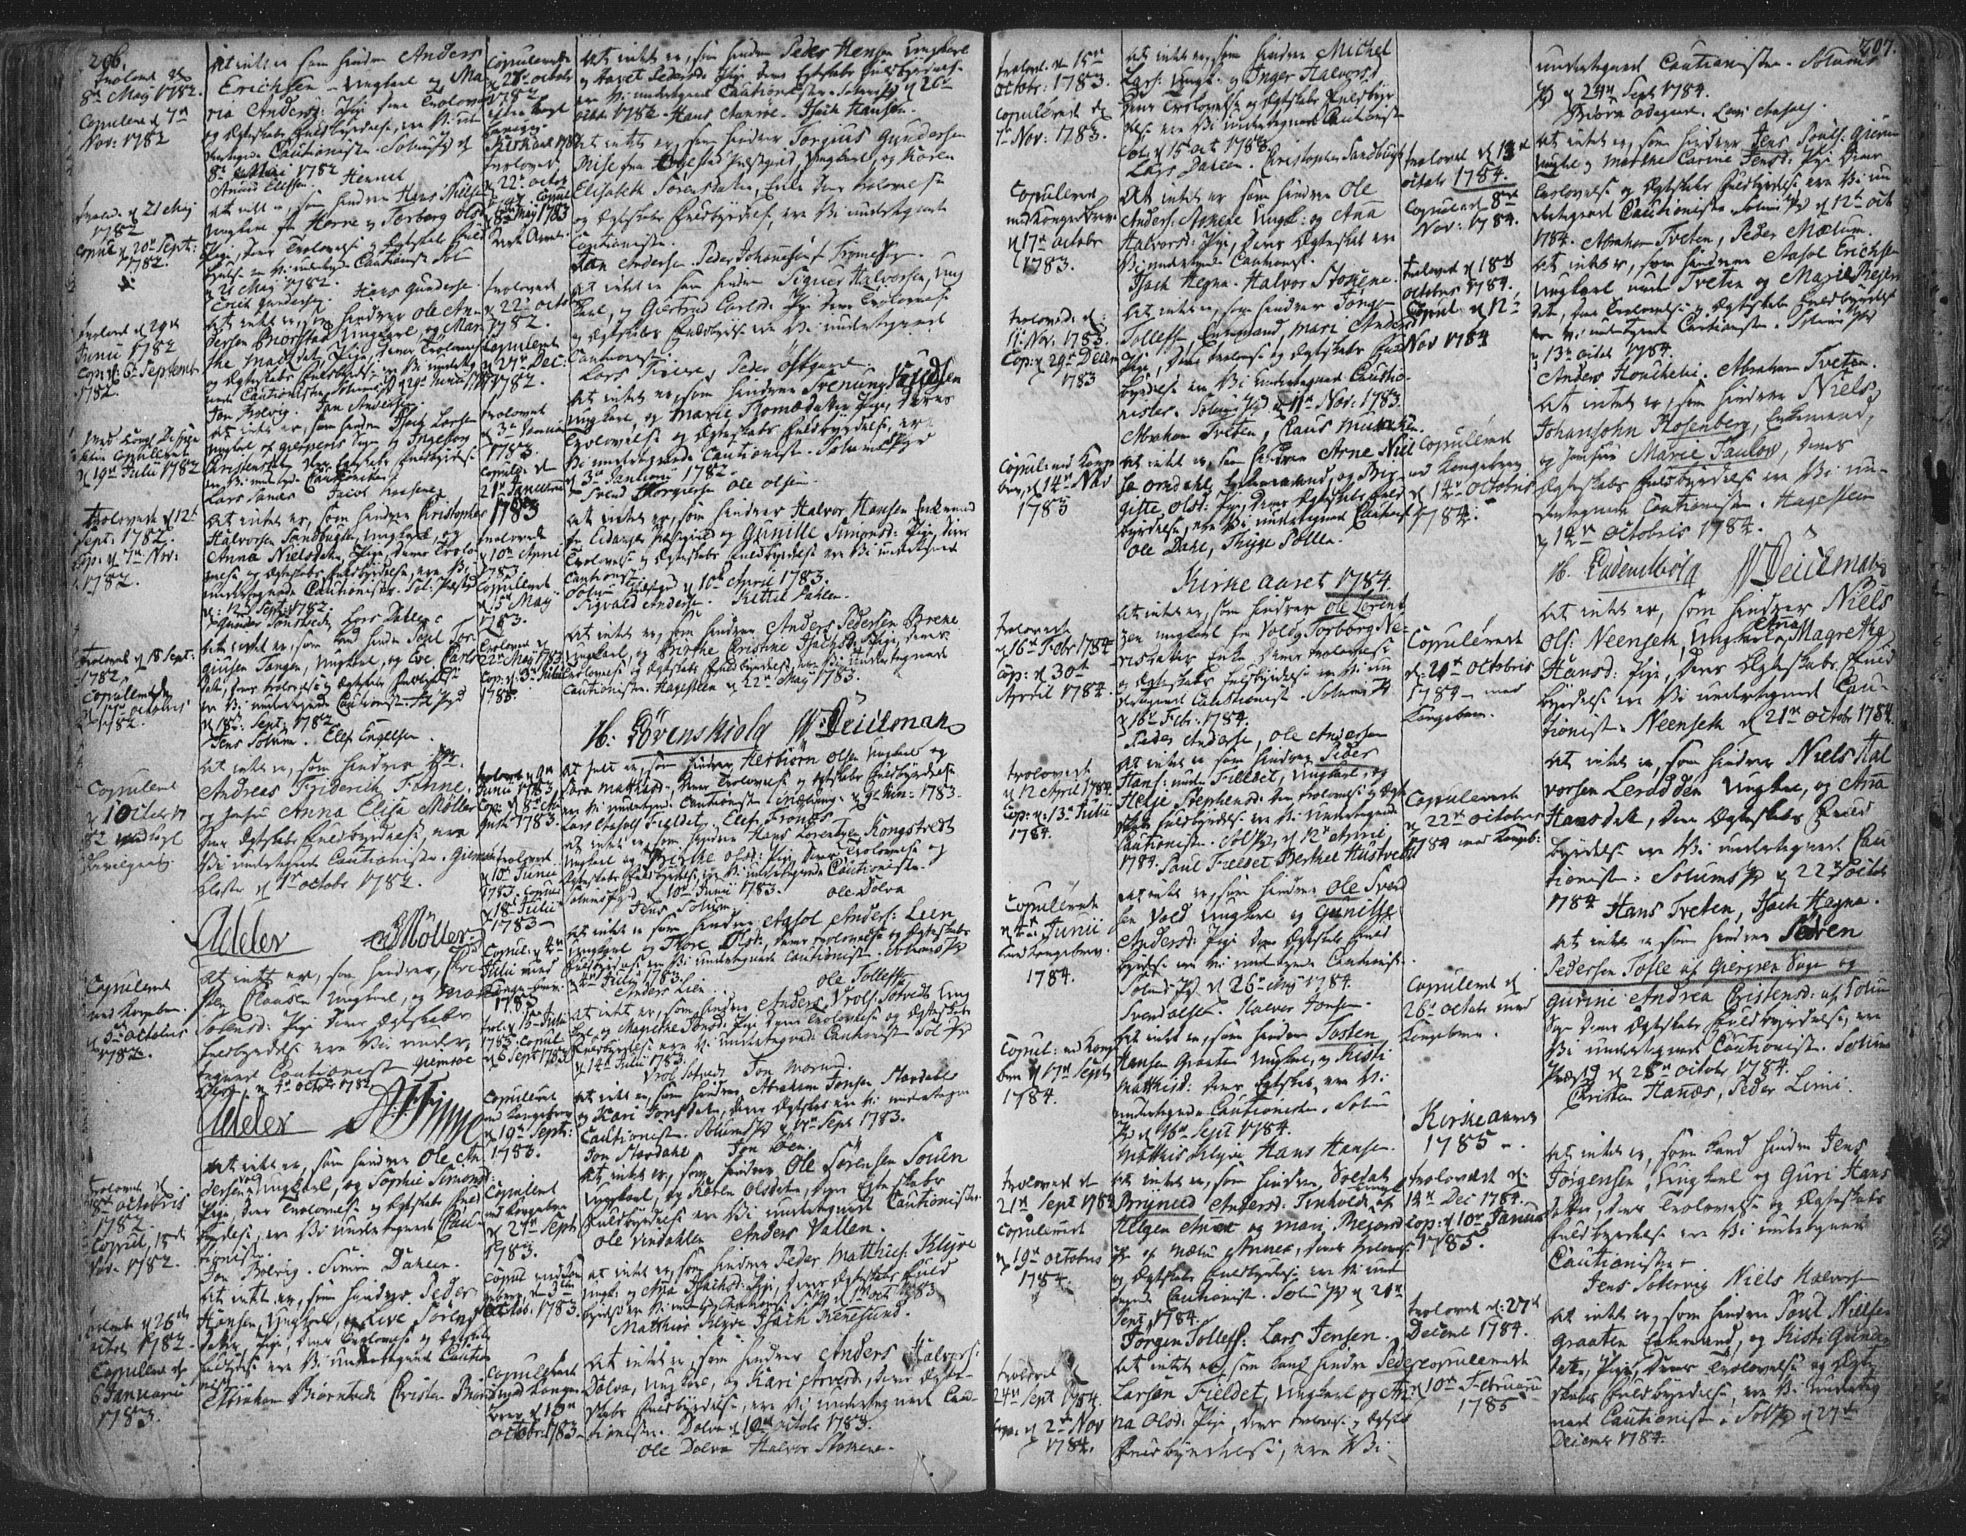 SAKO, Solum kirkebøker, F/Fa/L0003: Ministerialbok nr. I 3, 1761-1814, s. 206-207